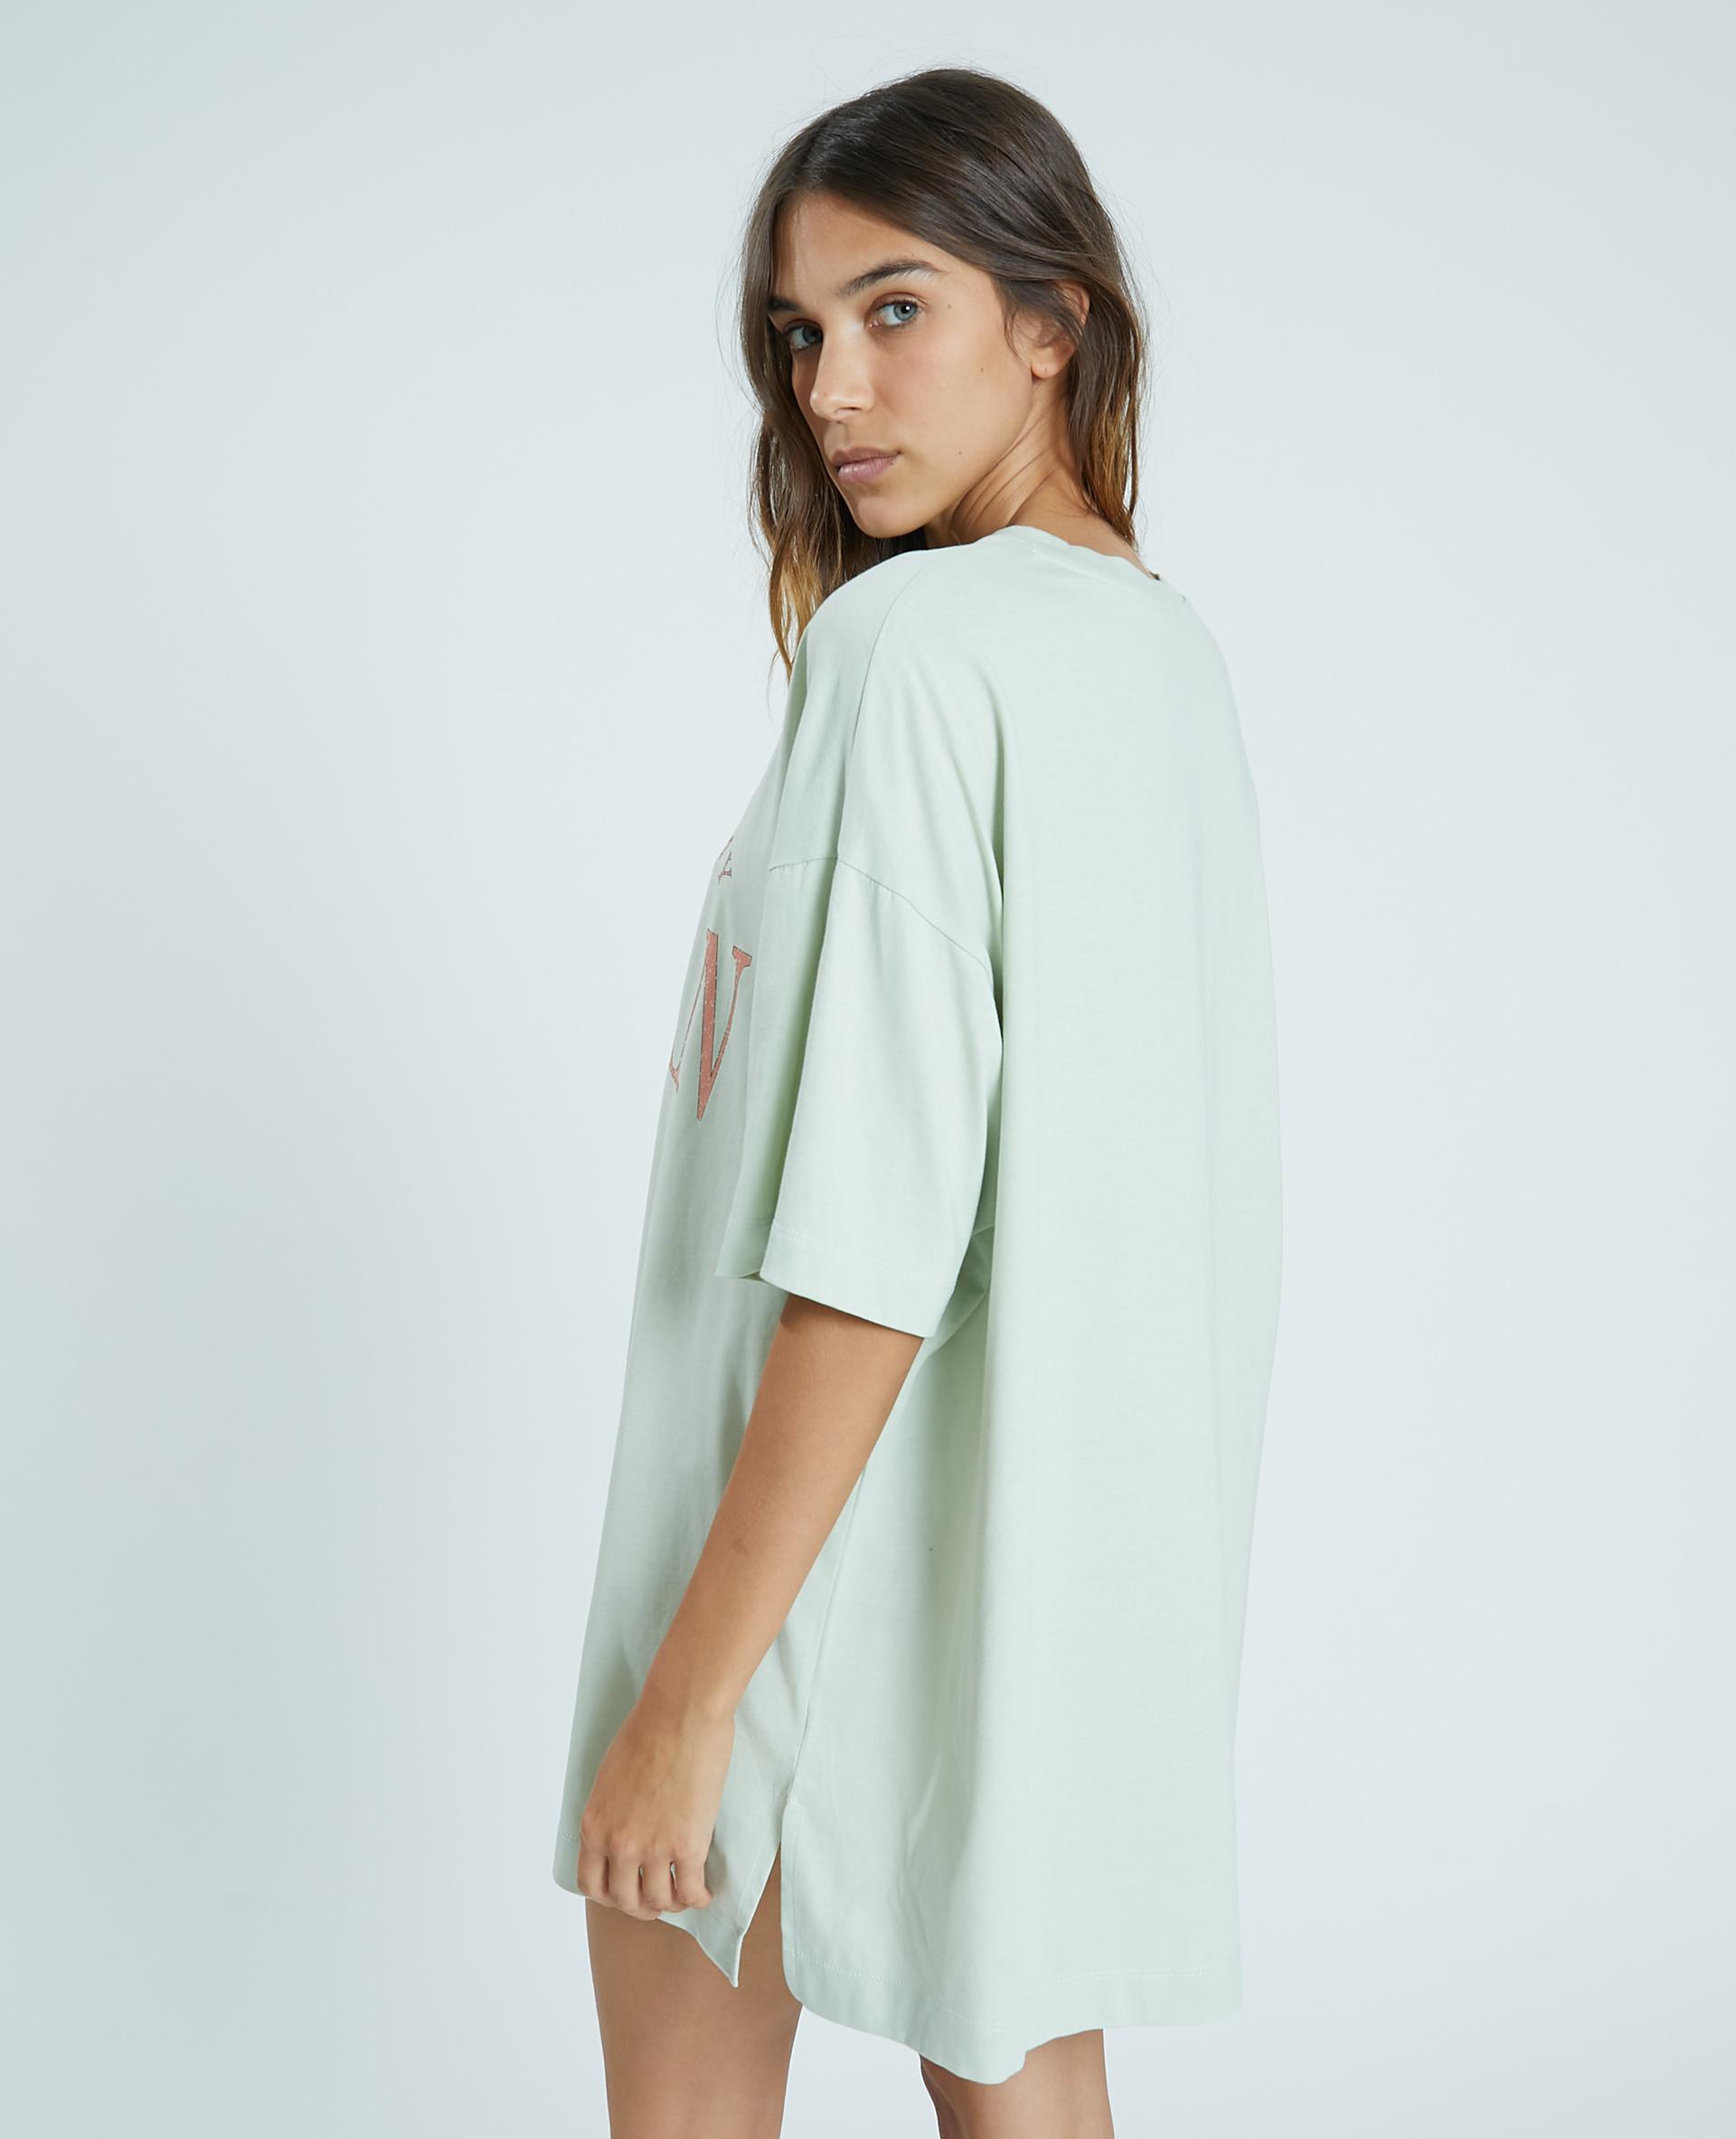 Tee-shirt oversize vert - Pimkie